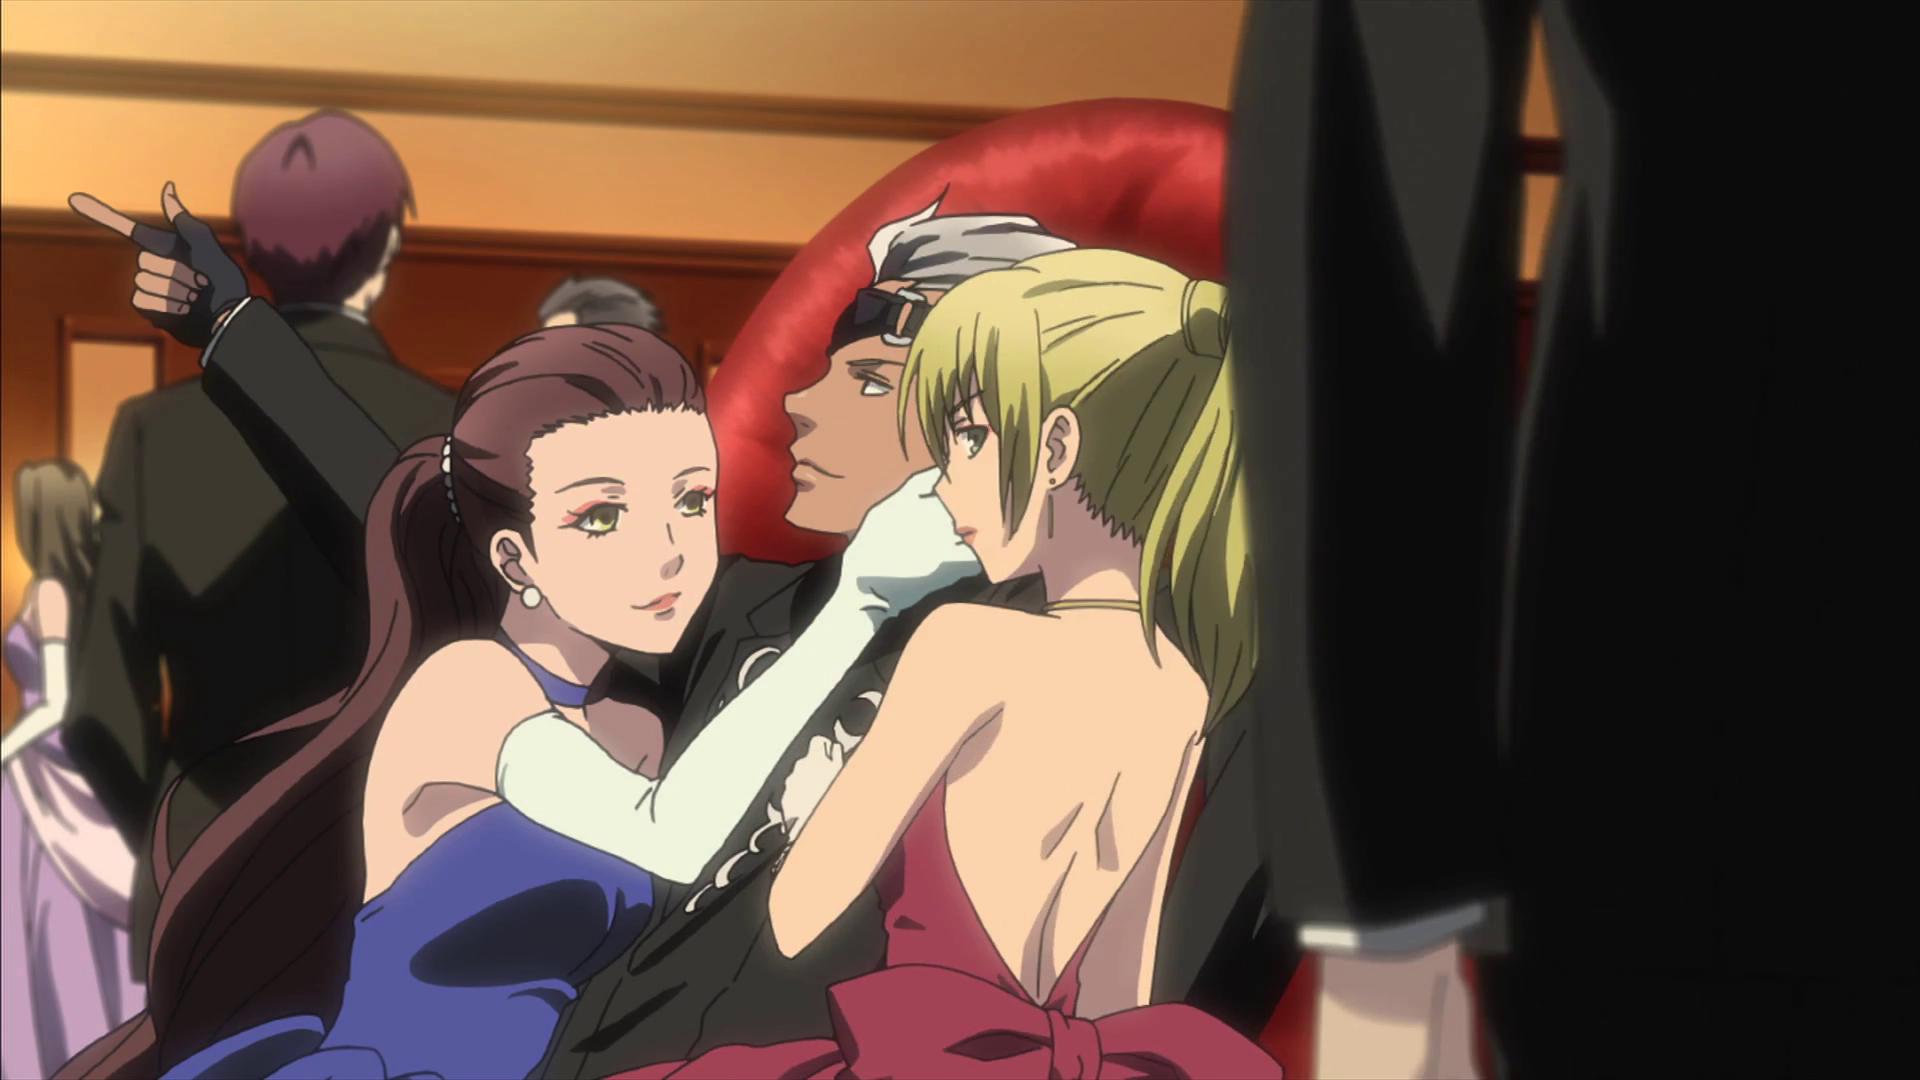 flirting games anime characters: